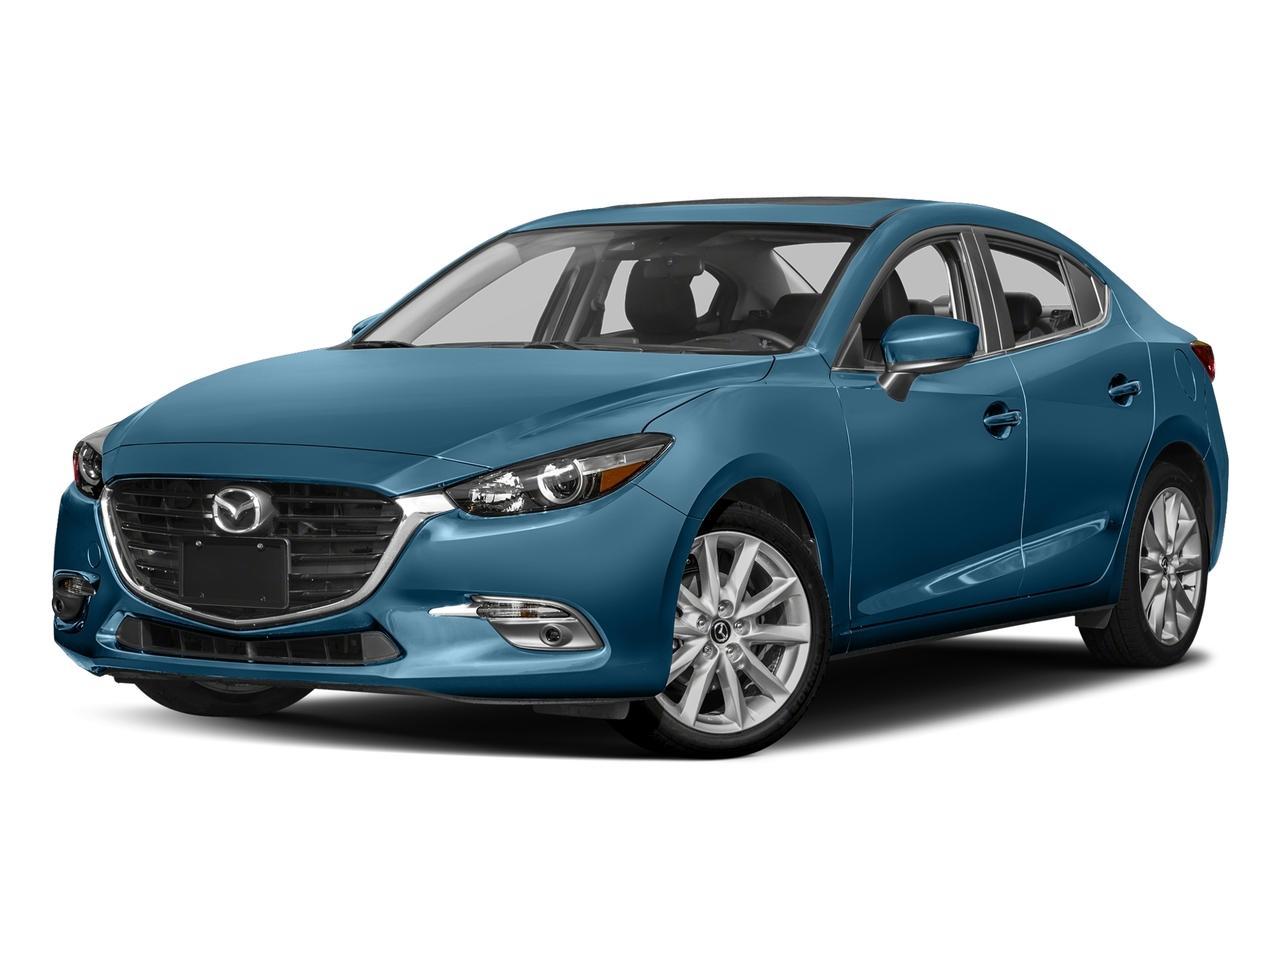 2017 Mazda Mazda3 4-Door Vehicle Photo in Portland, OR 97225